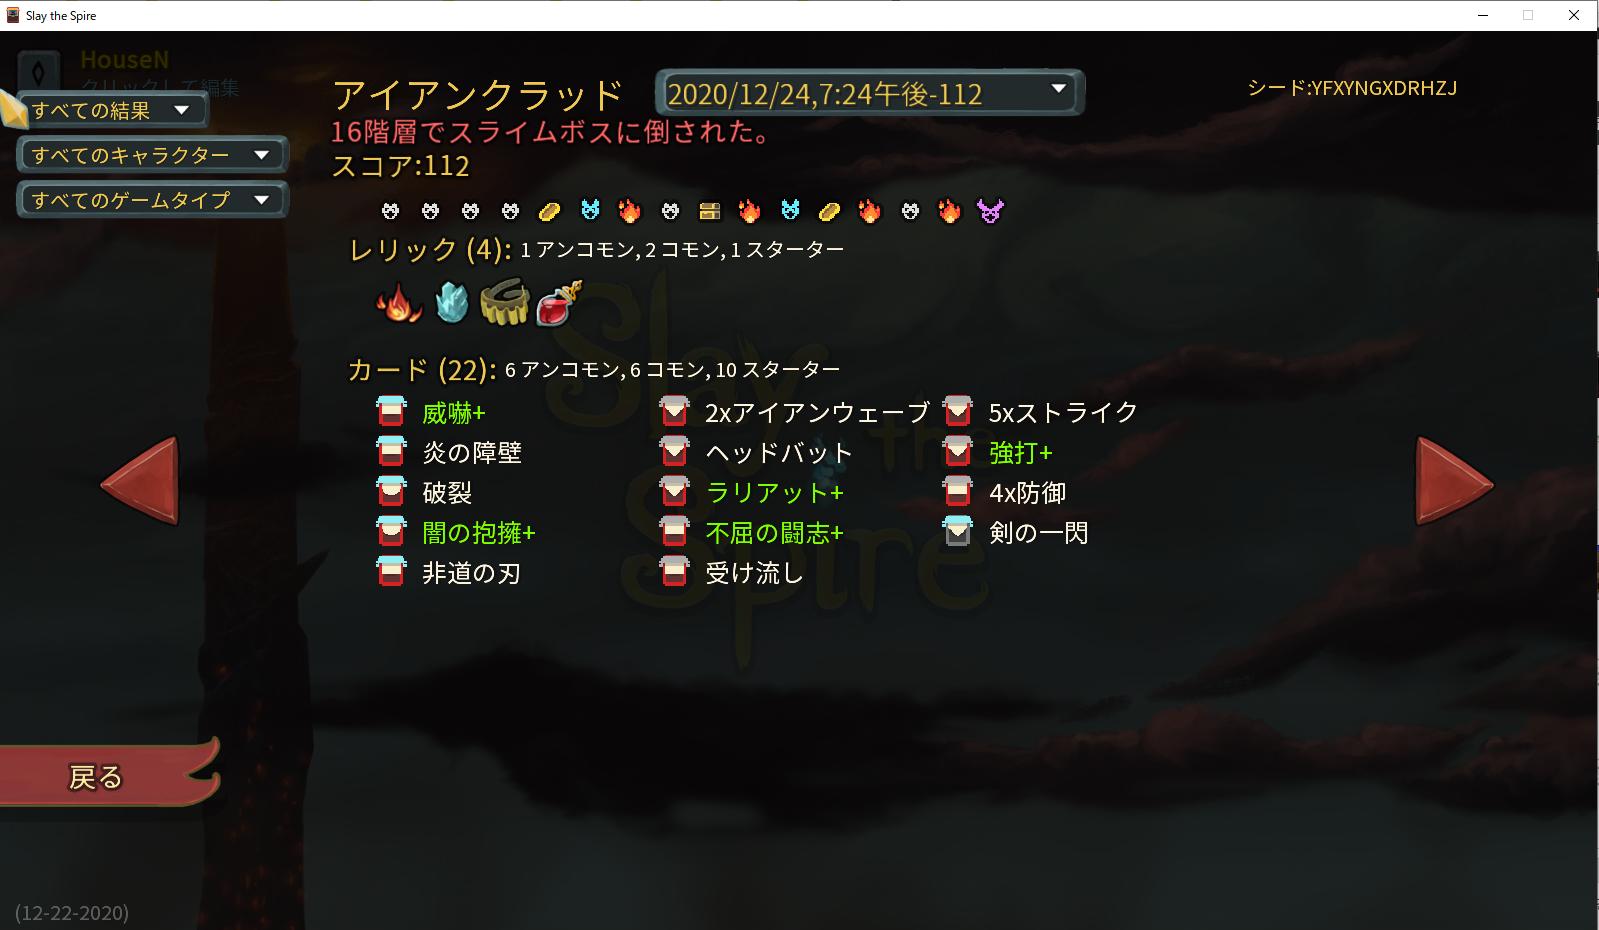 f:id:himajin-mode:20201224224842p:plain